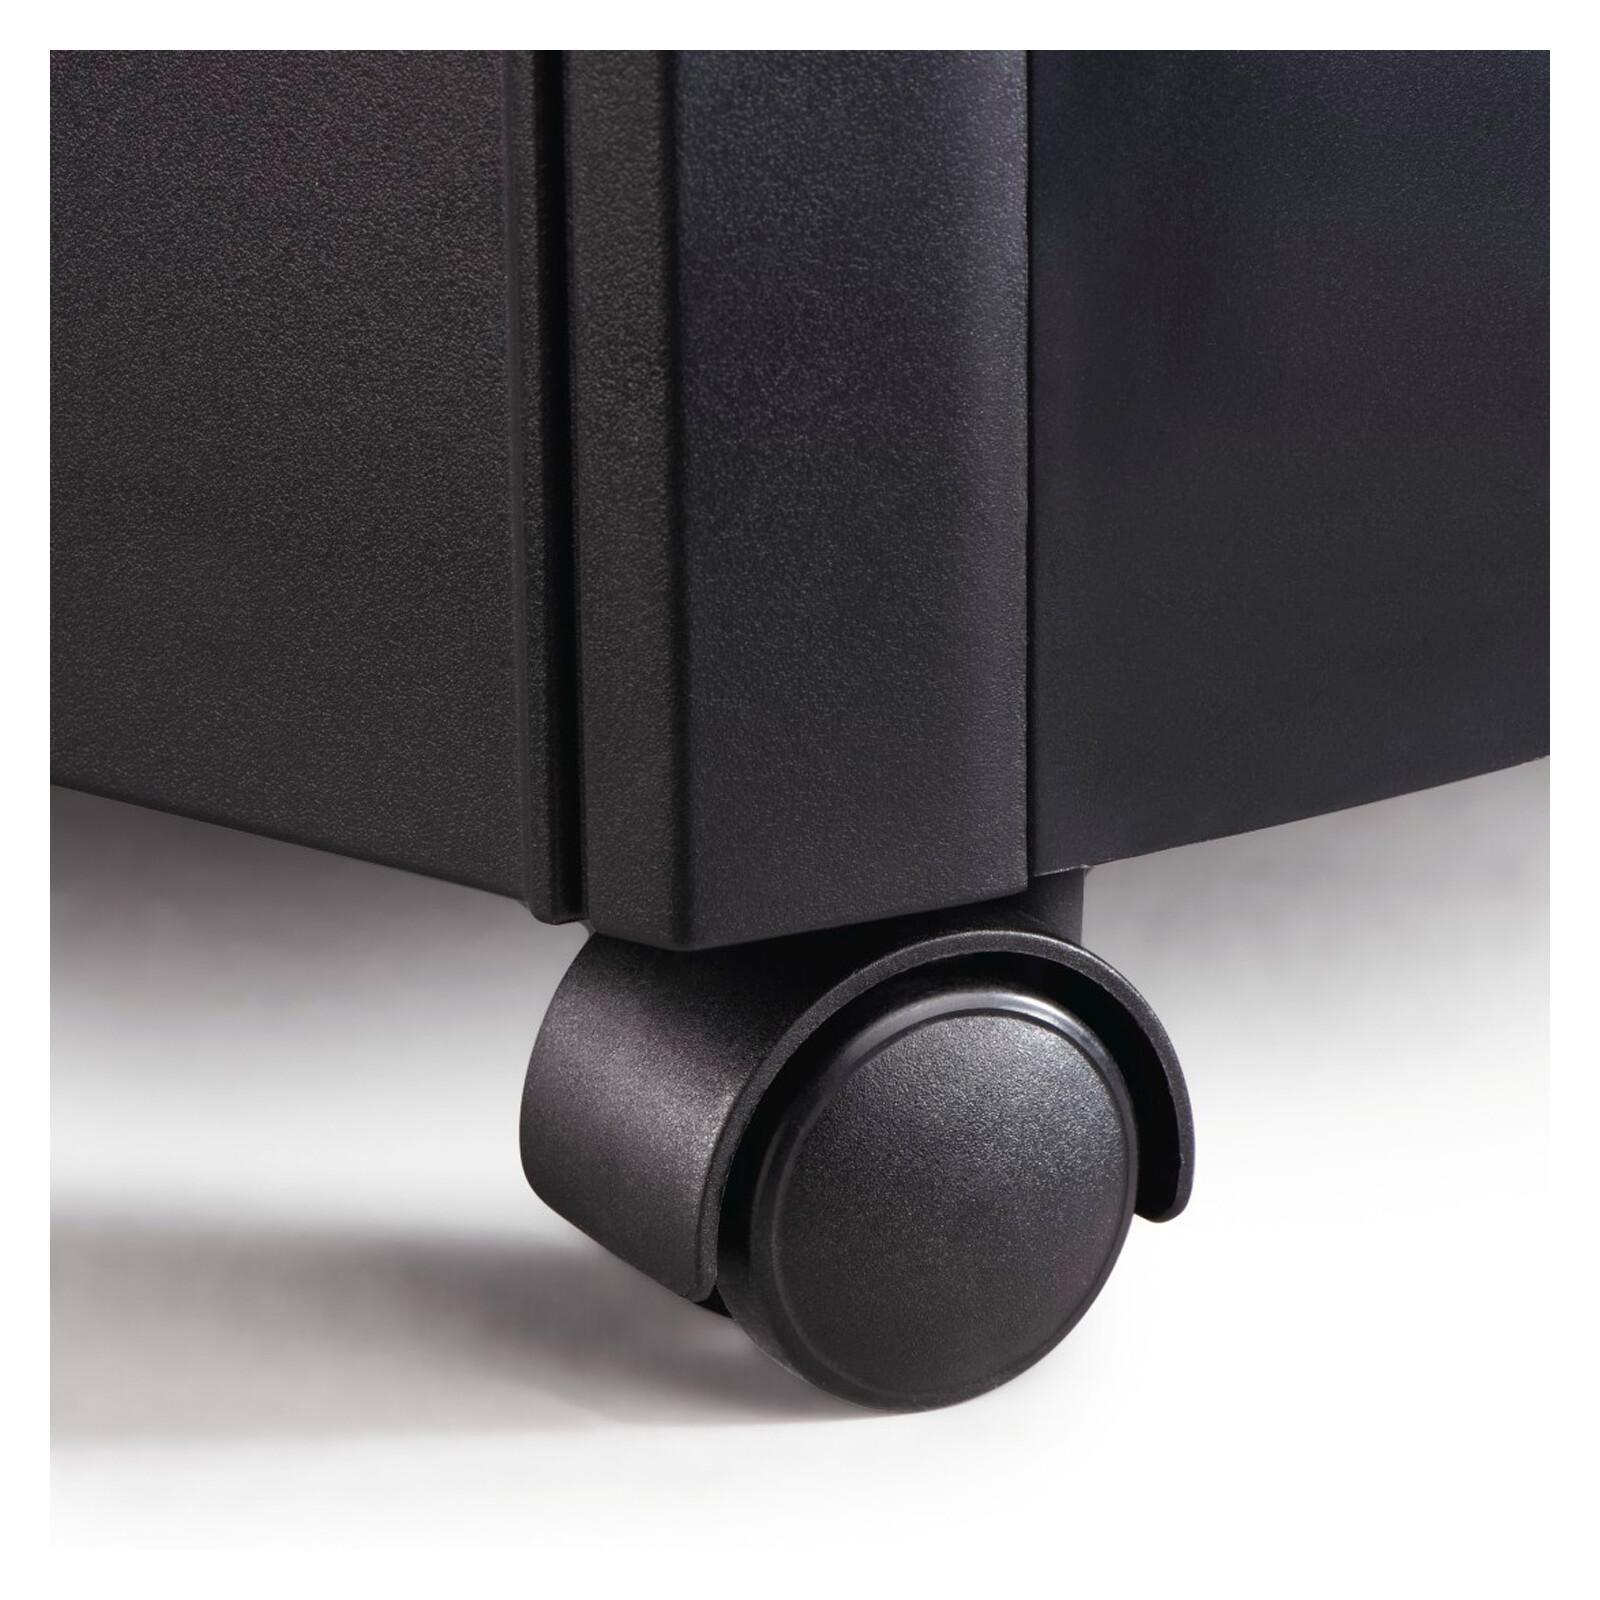 Hama 50546 Aktenvernichter Premium M10